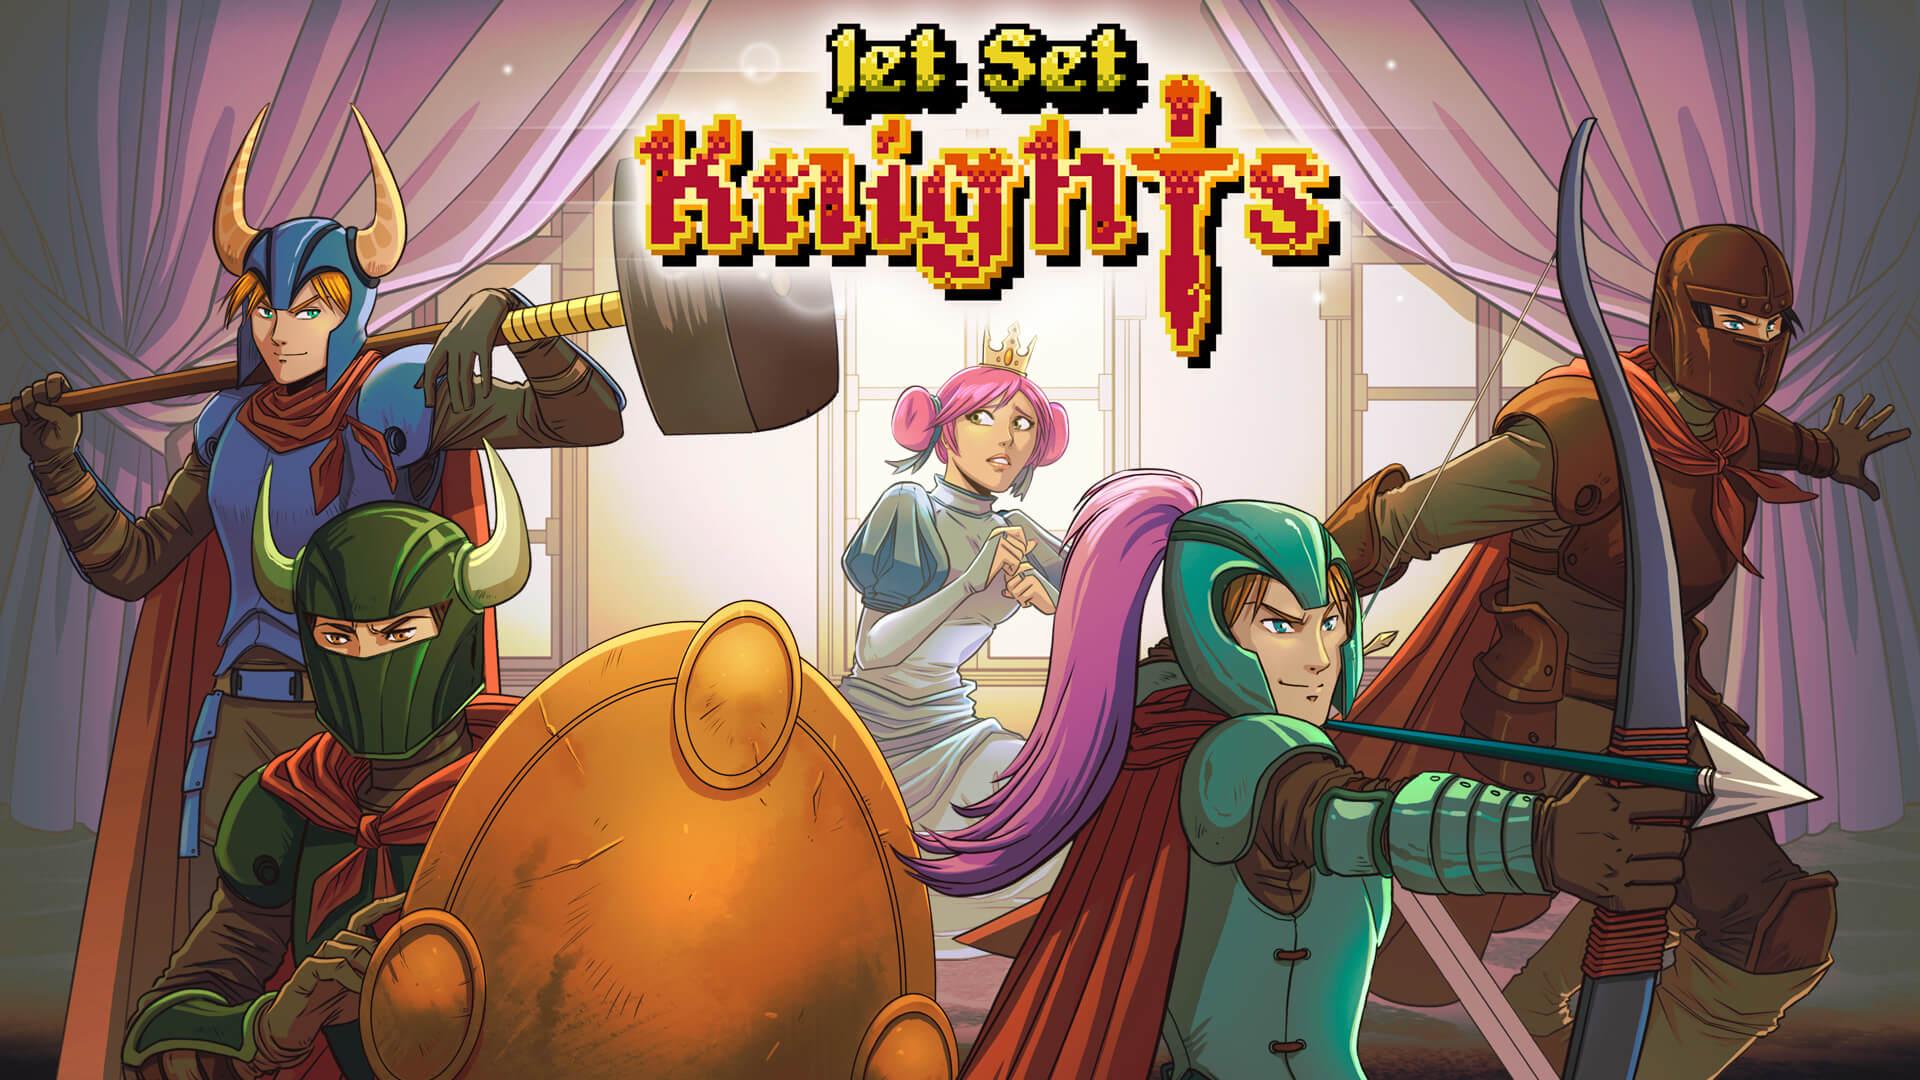 Jet Set Knights Free PC Download